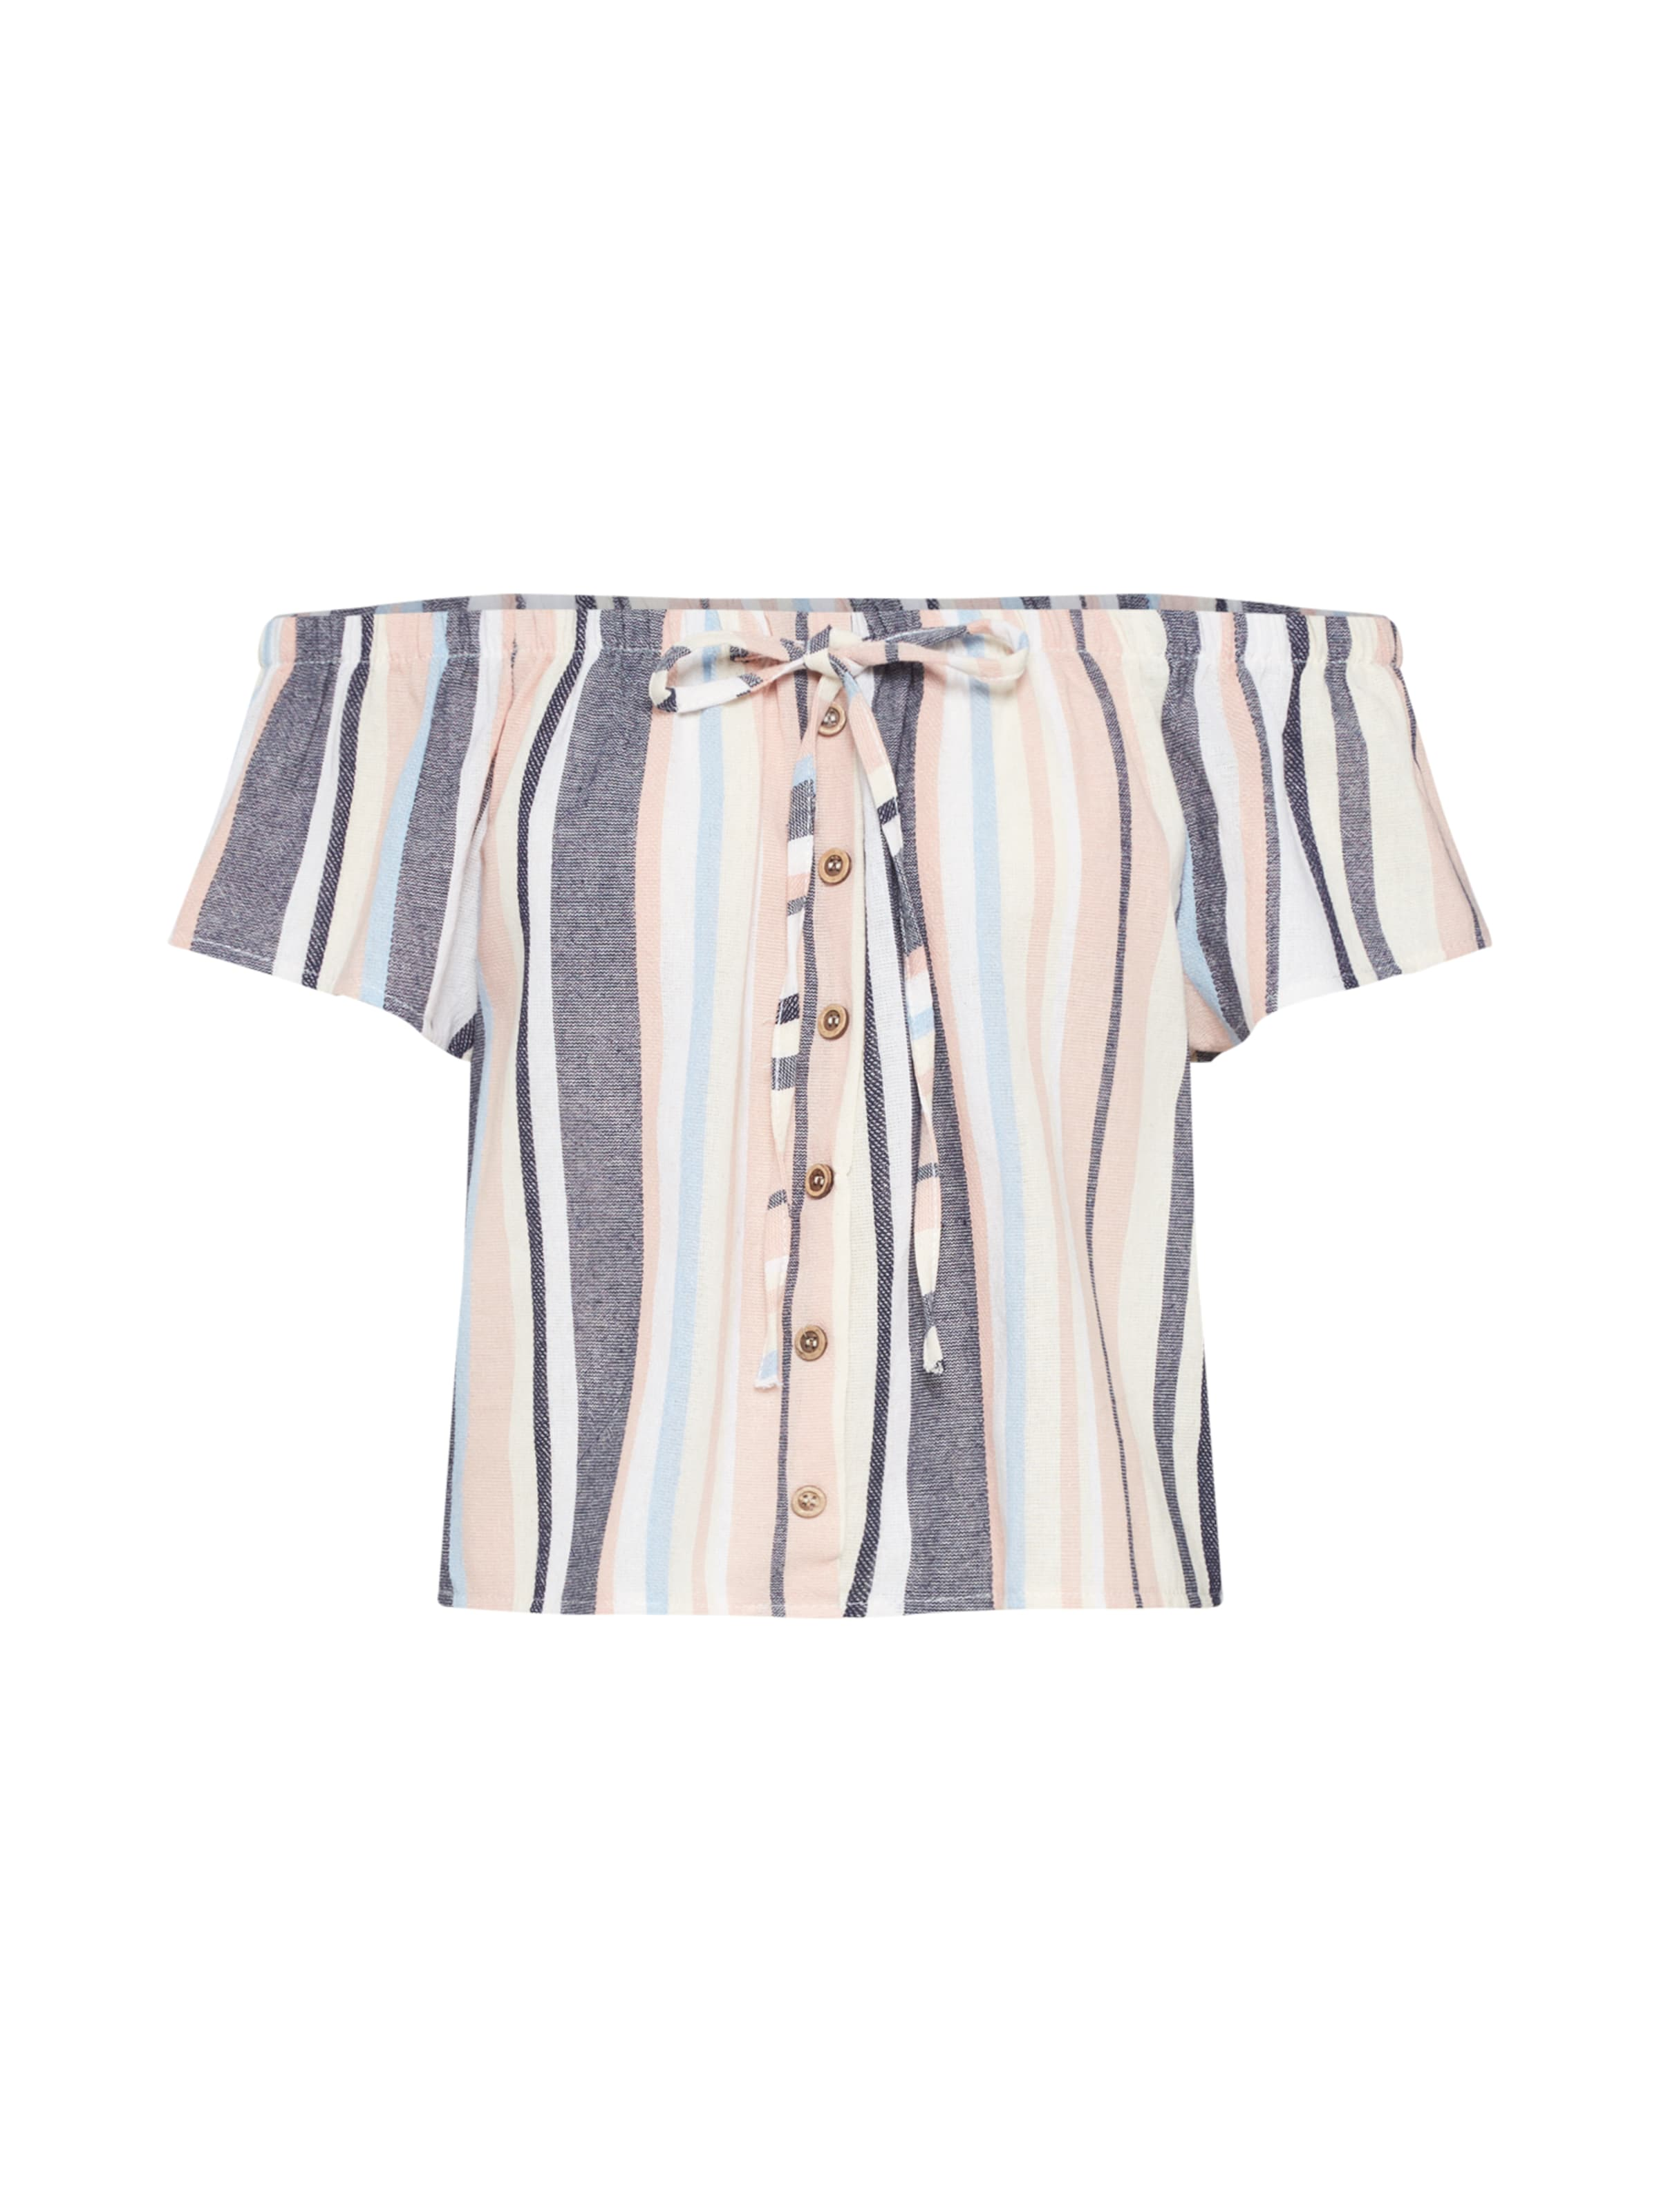 Kirah' Tp C Blanc En RoseNoir shirt 'ss Hailys T DYbeE9IWH2